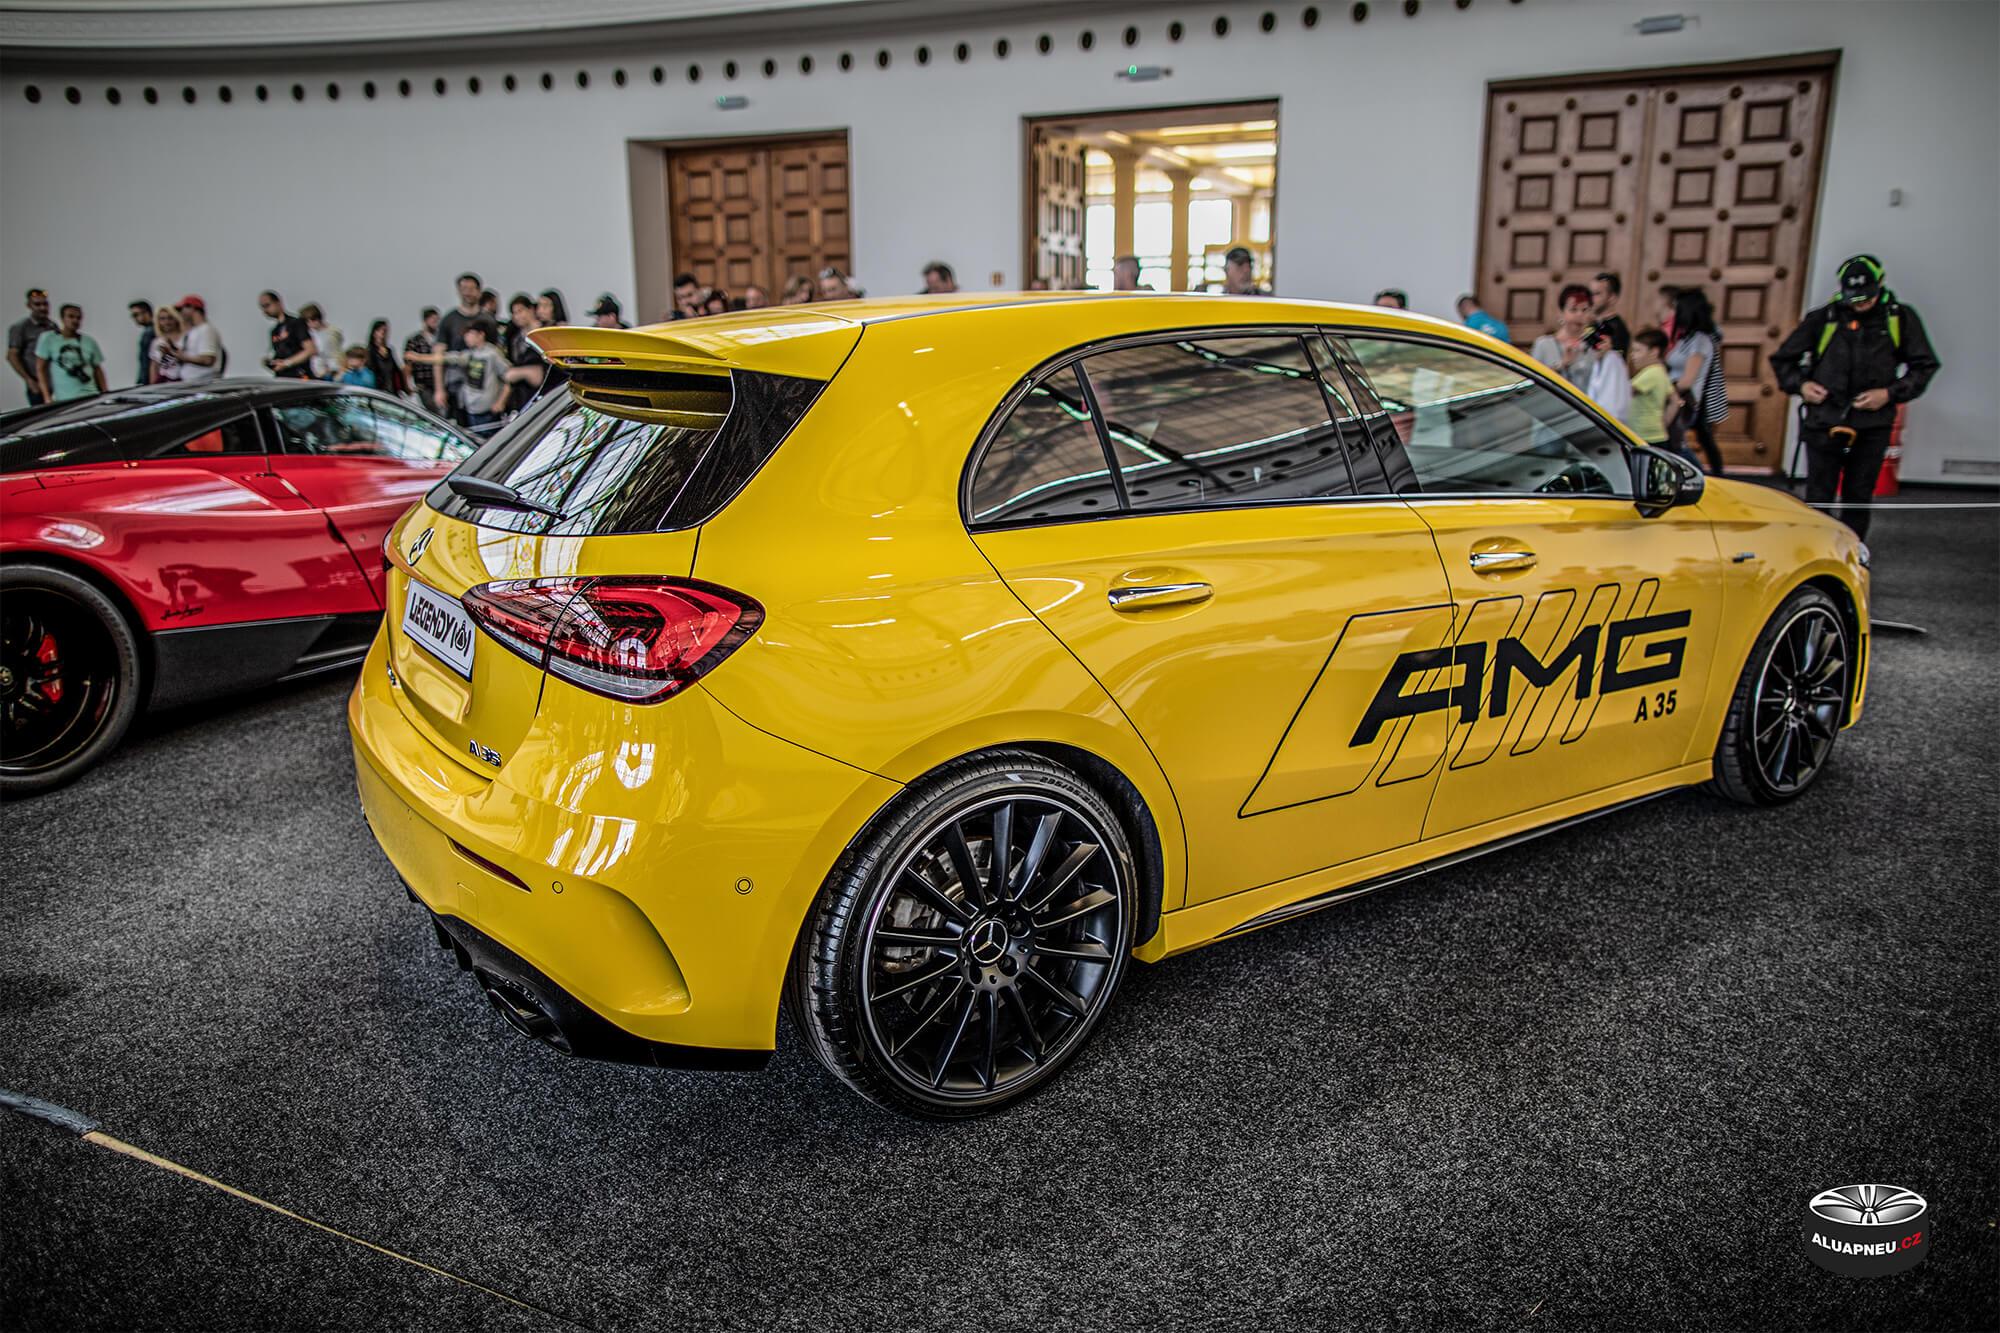 Originální černá alu kola Mercedes A45 Amg - Automobilové Legendy 2019 - www.aluapneu.cz